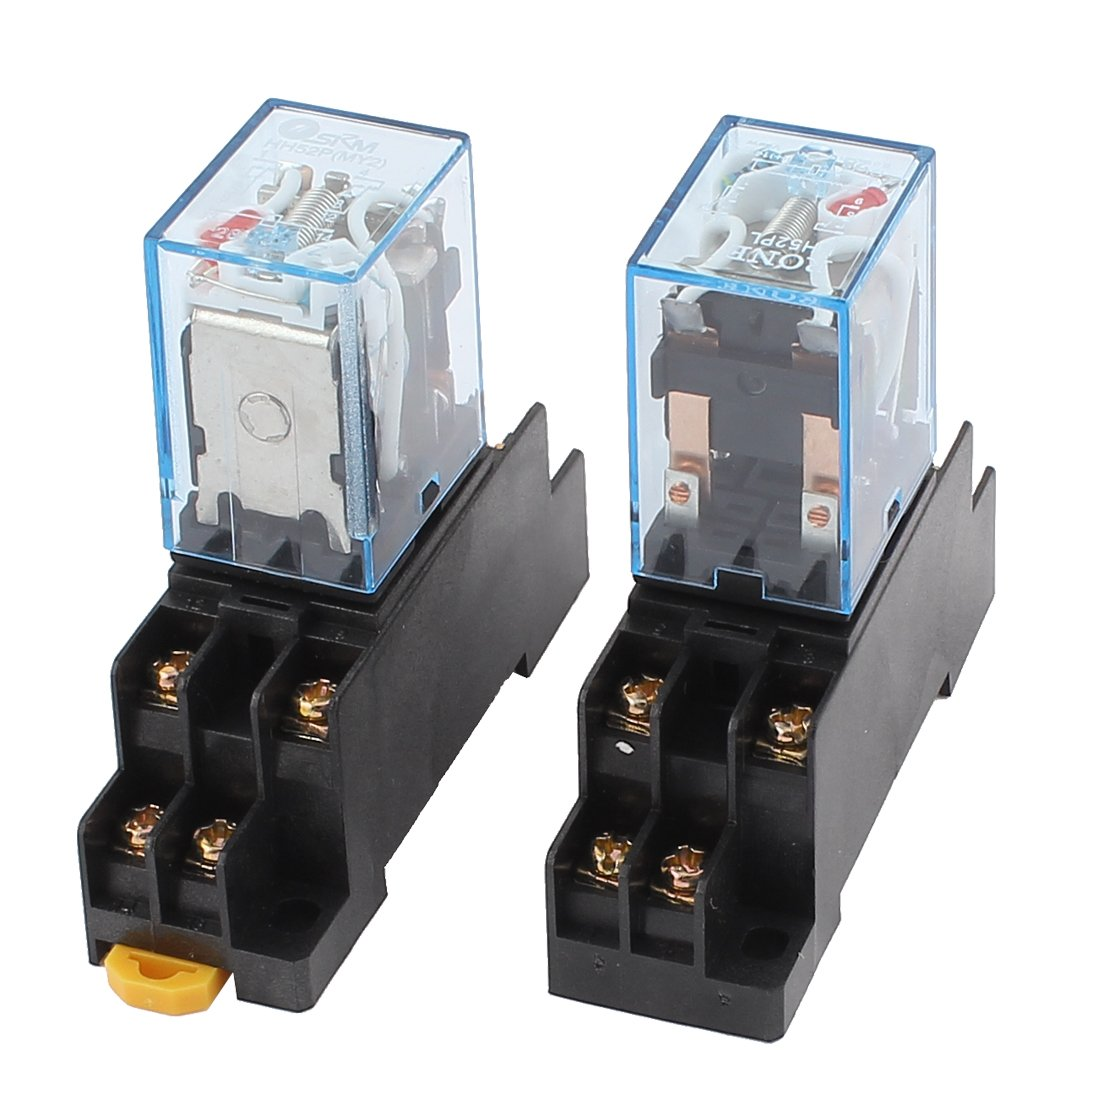 2 x AC 110V/120V 5A Coil Red Light DPDT 8Pin Power Relay + Socket Base US-SA-AJD-106277